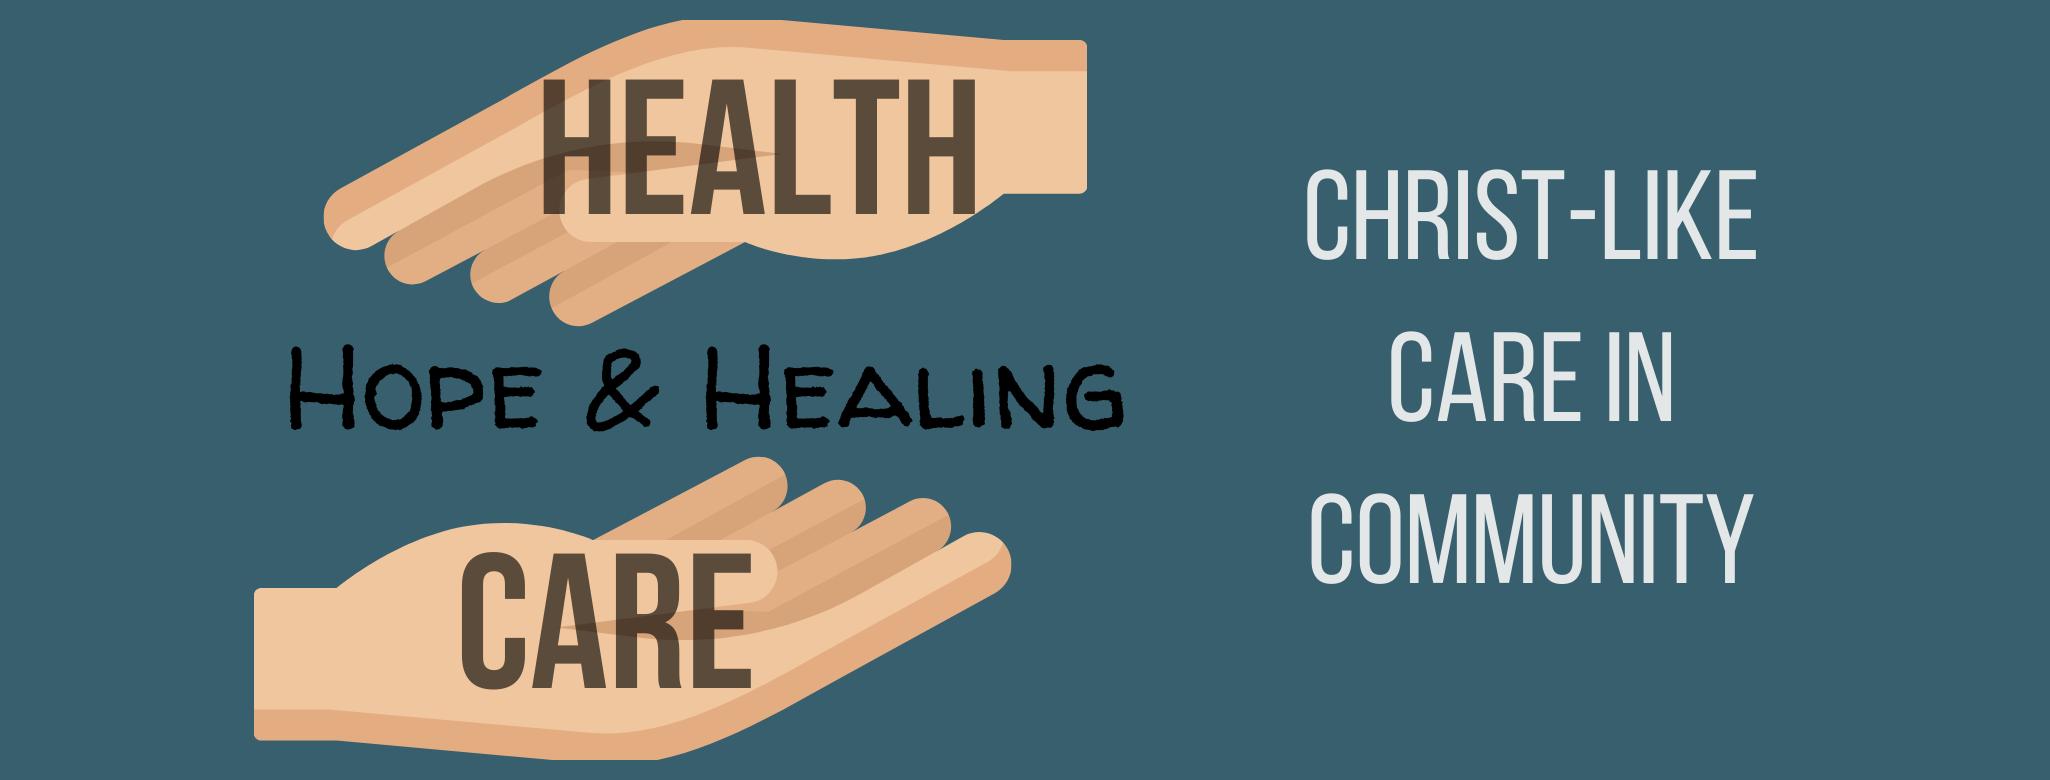 Andover UMC Health-Hope & Healing Worship Series 2021